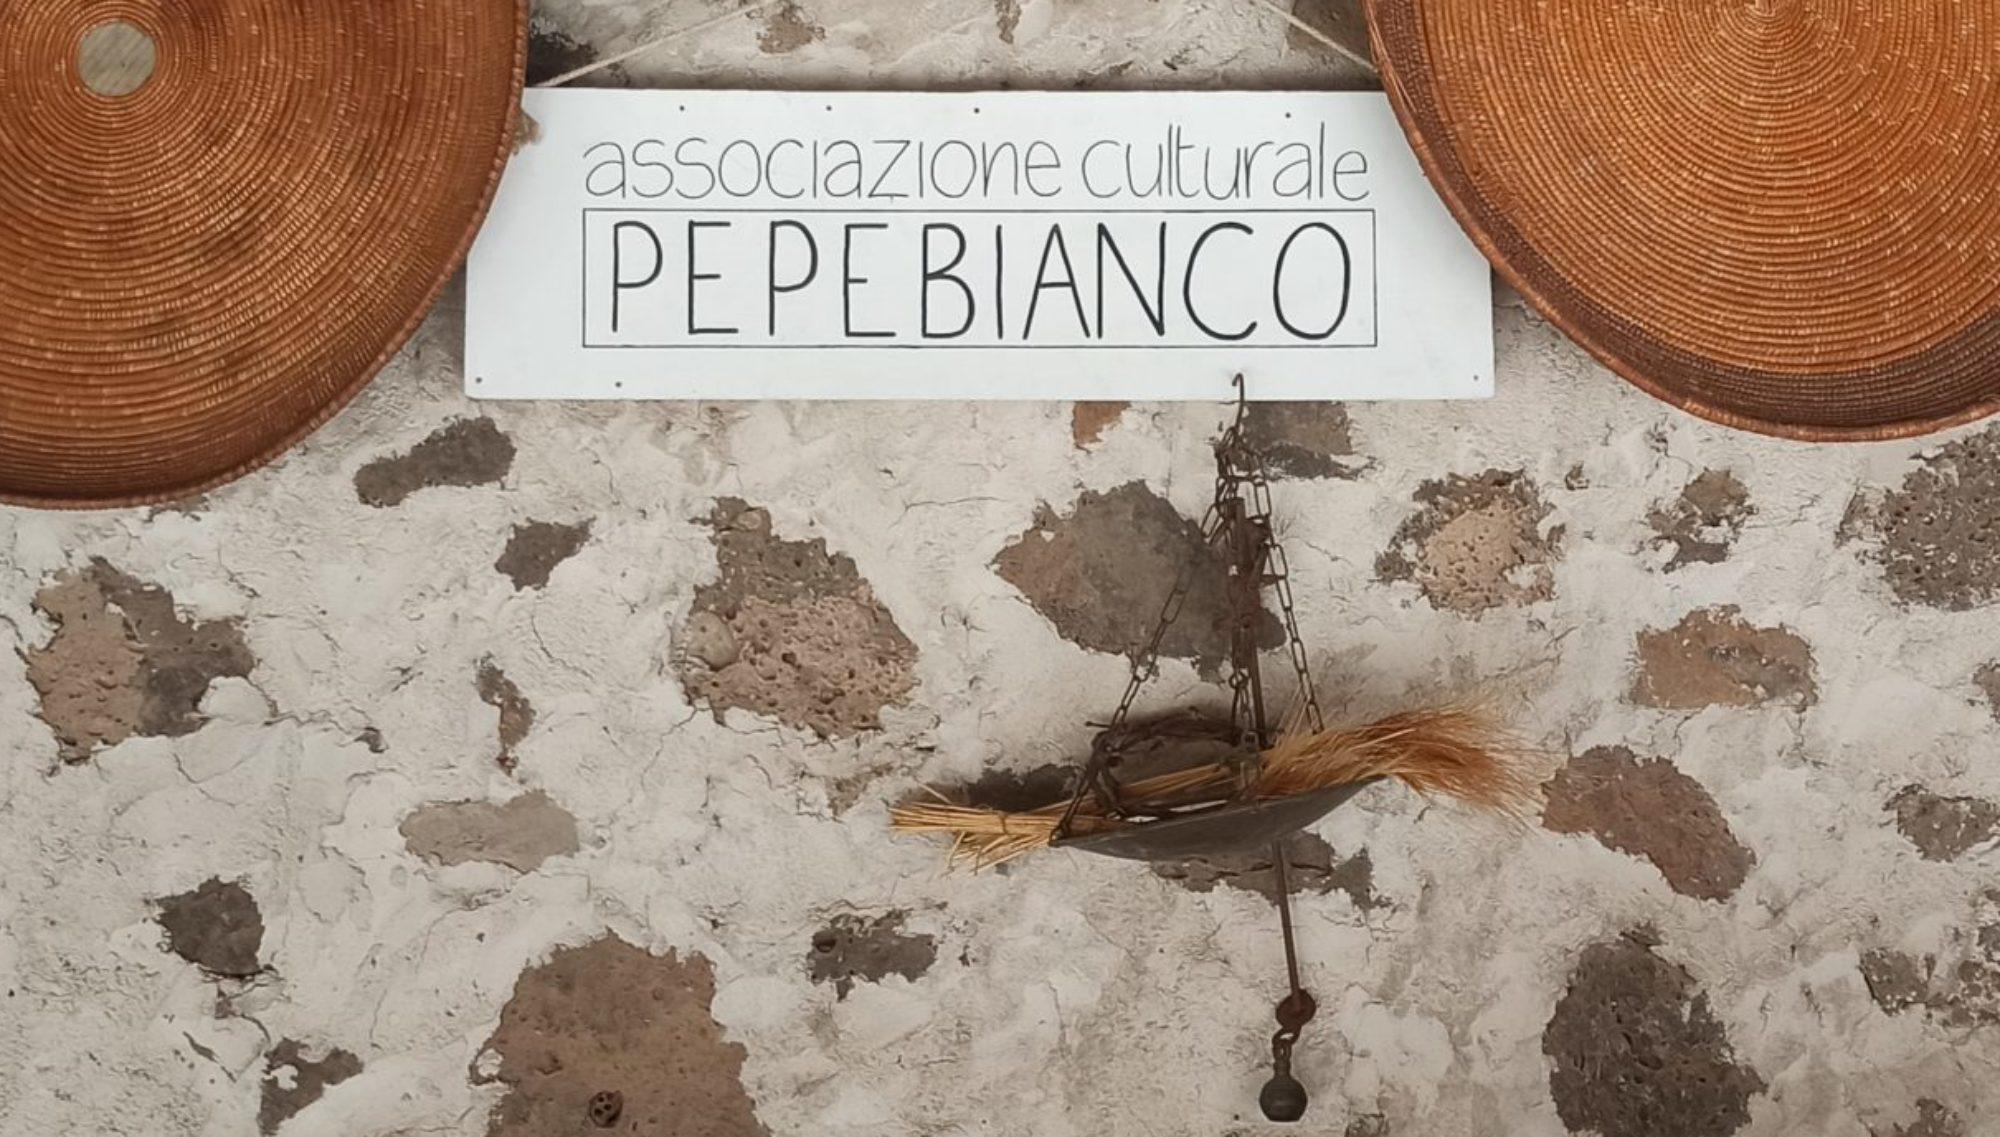 PEPEBIANCO APS